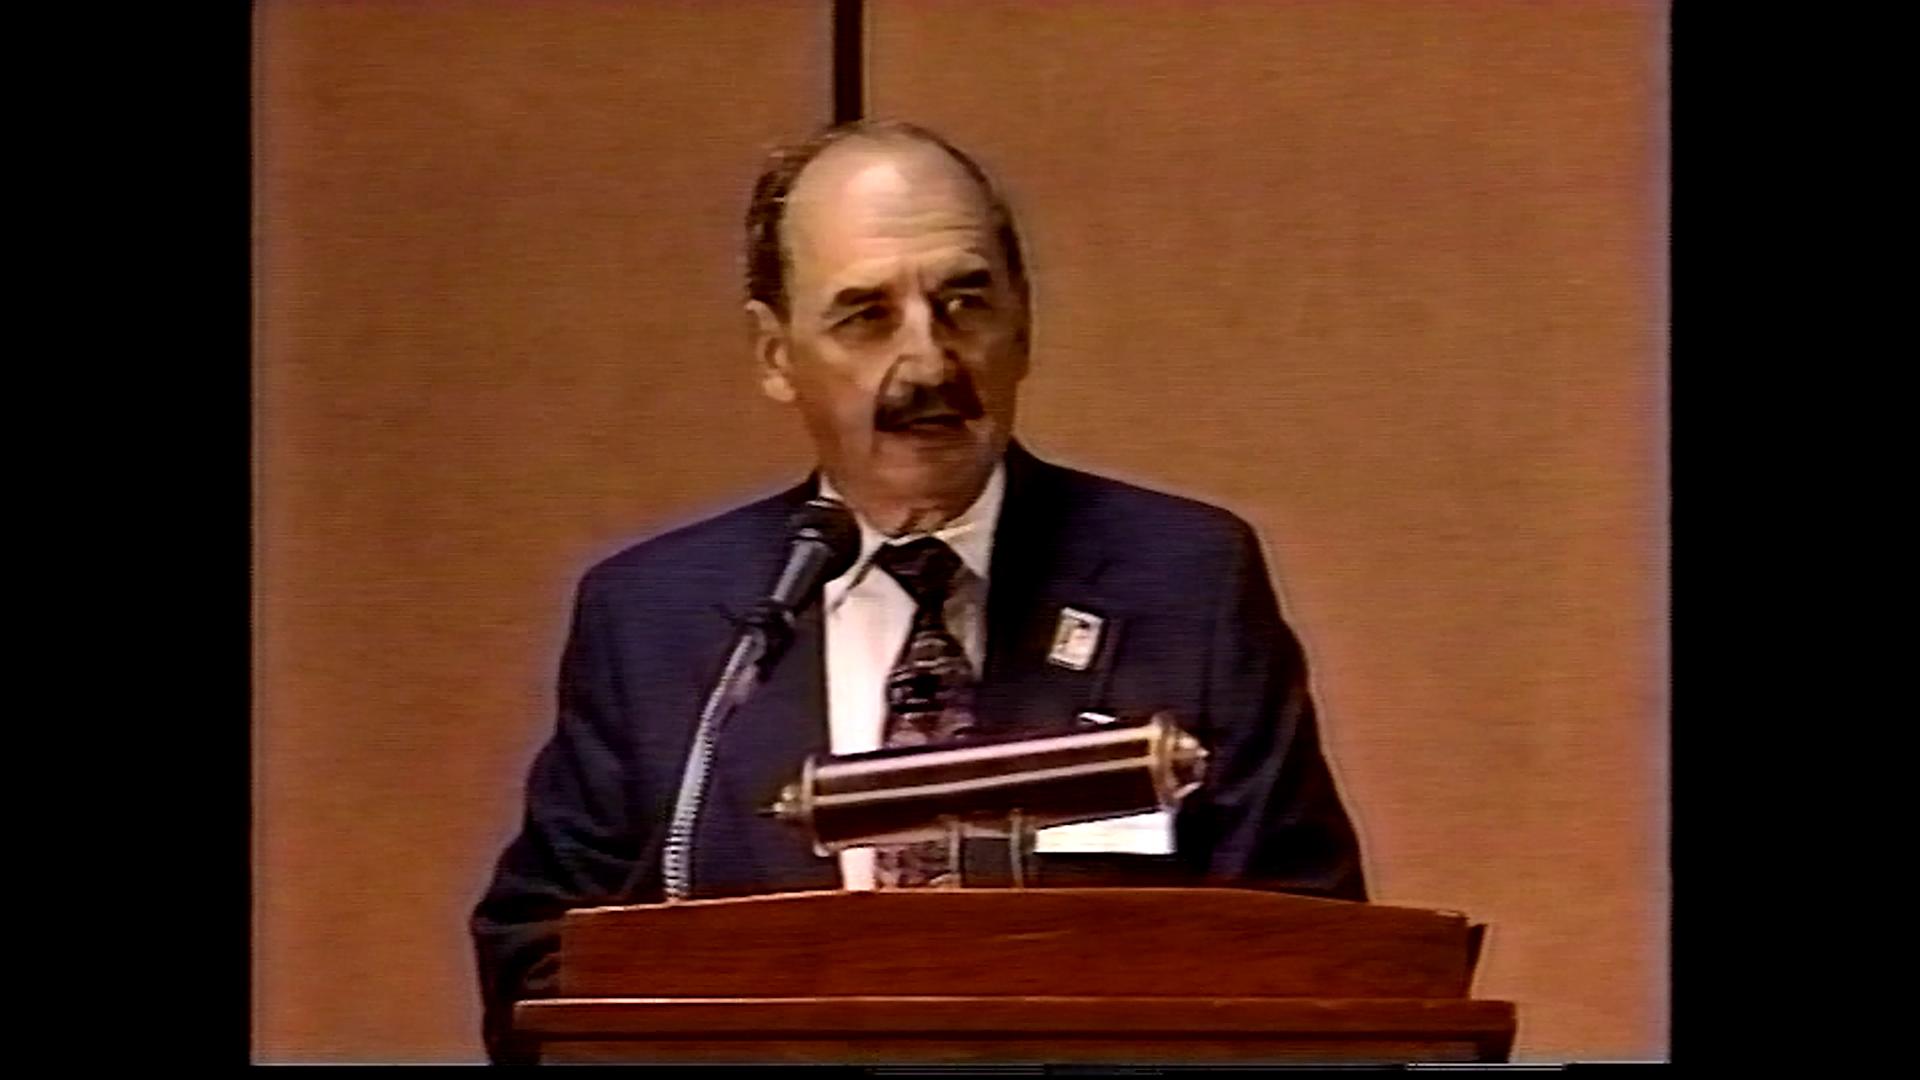 Video: Sherlock Holmes & Numismatics – 1991 ANA Convention Presentation